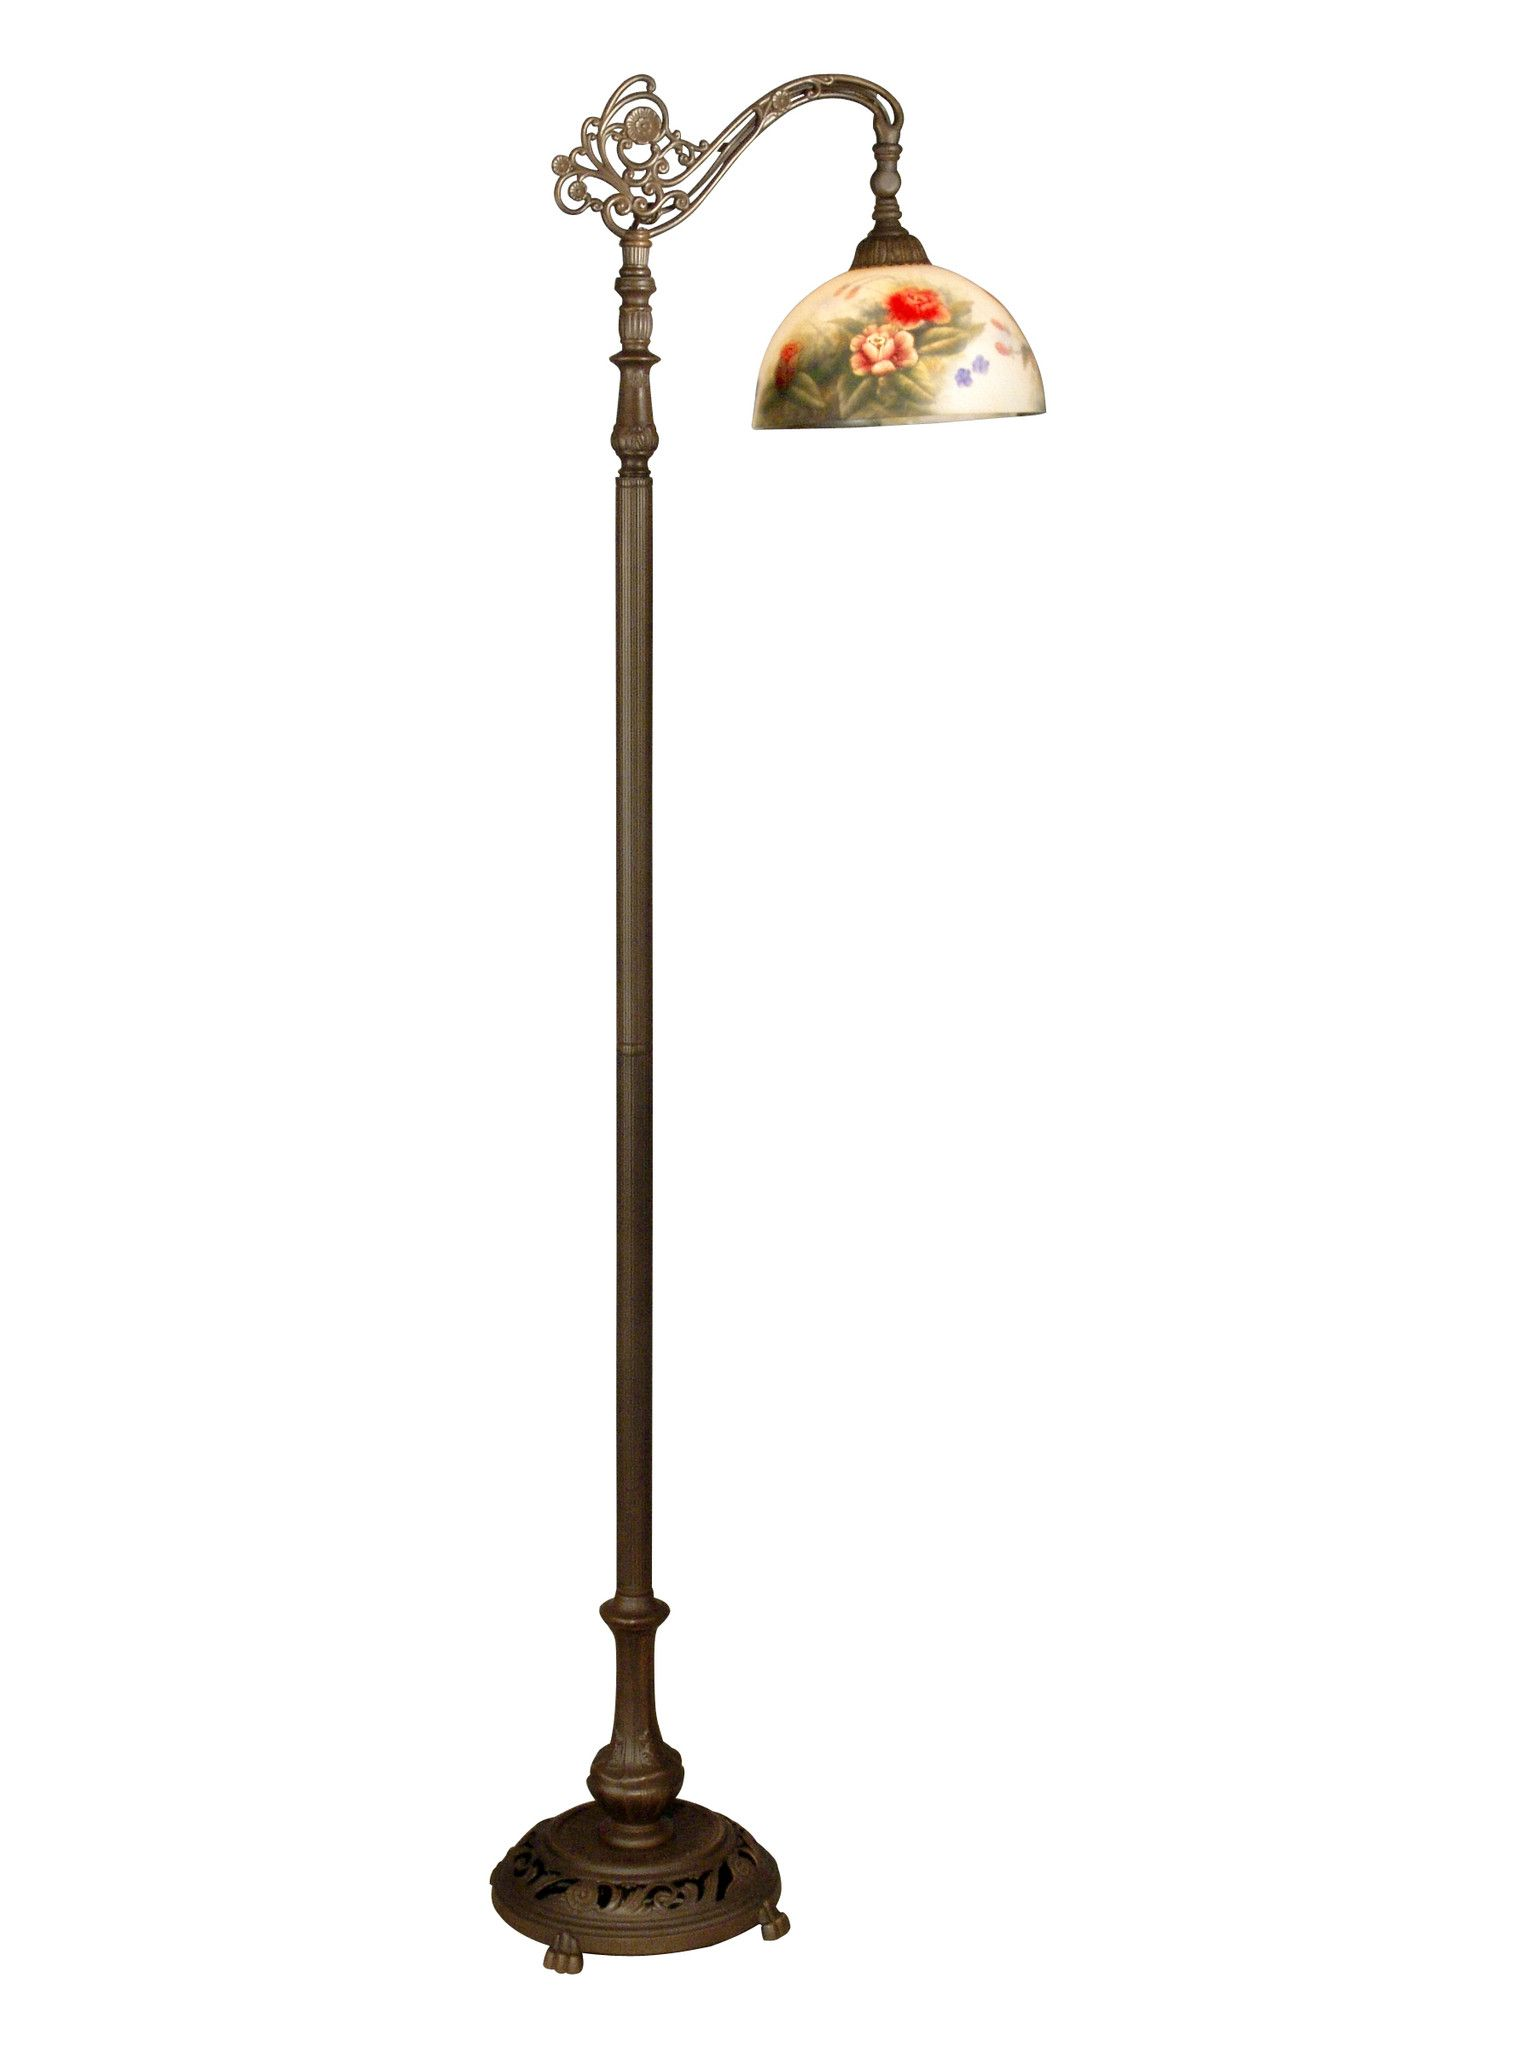 Dale Tiffany 10057 757 Rose Dome Downbridge Floor Lamp